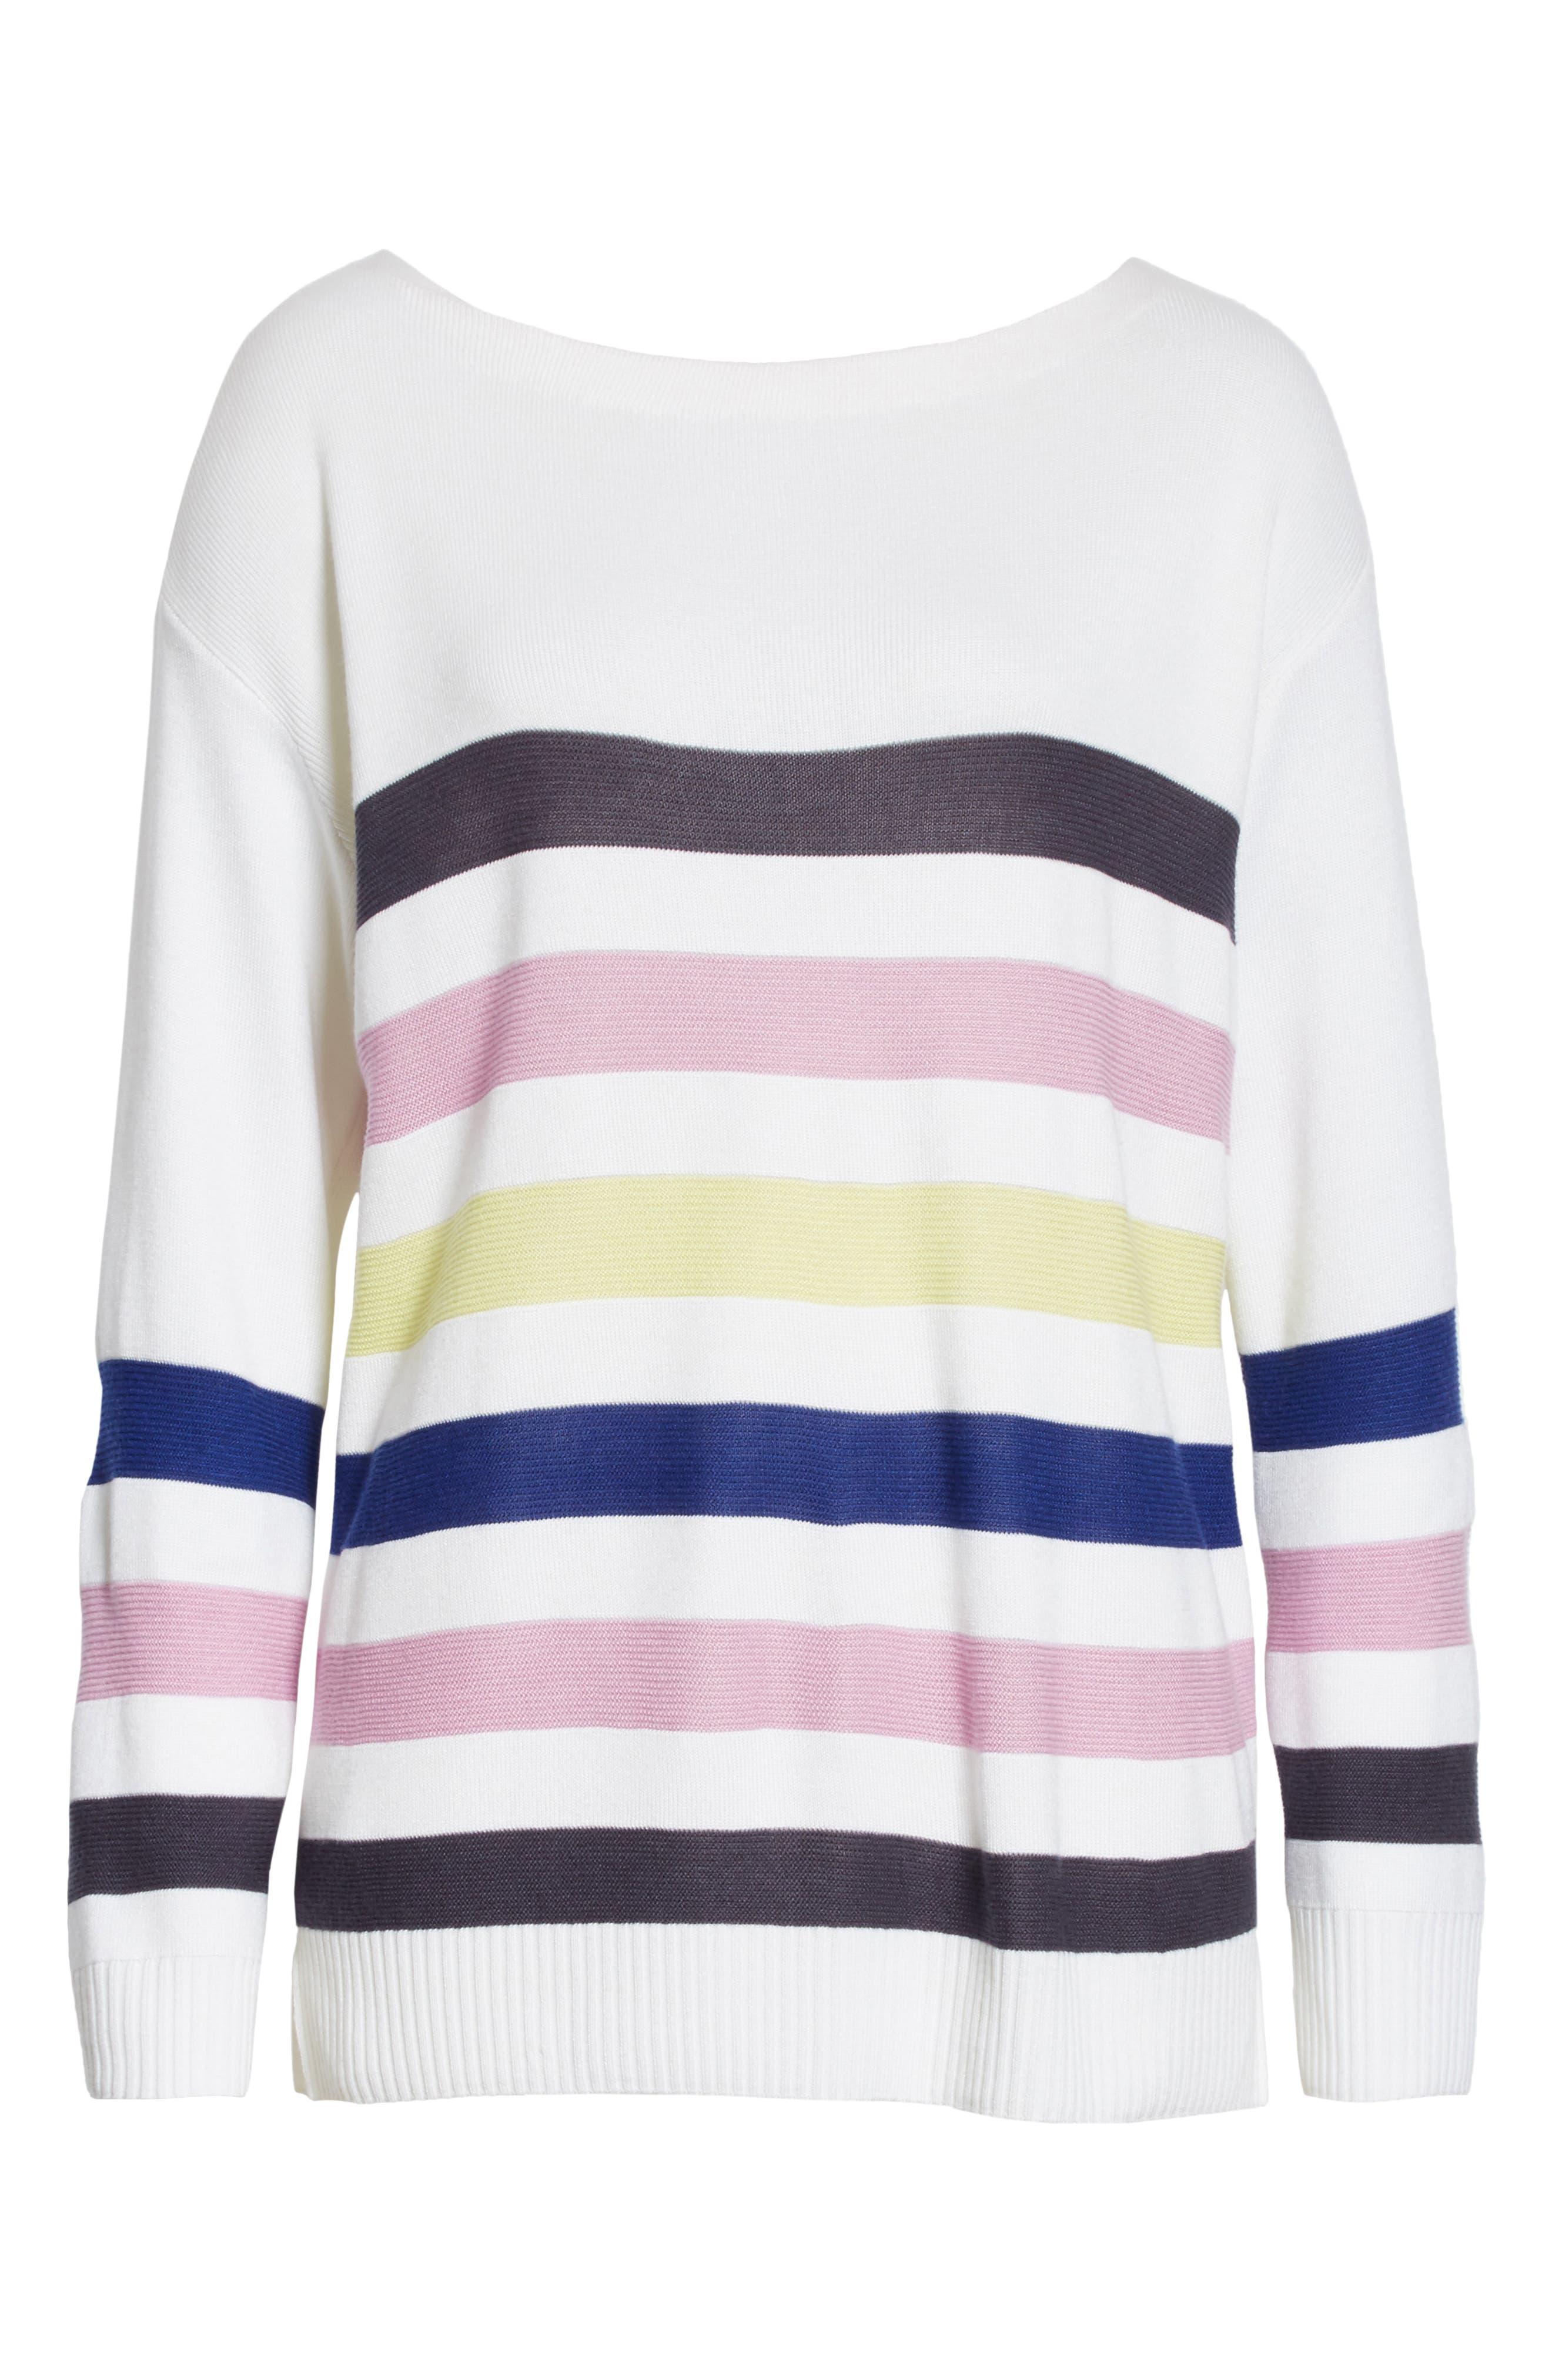 Links Stripe Knit Sweater,                             Alternate thumbnail 6, color,                             100